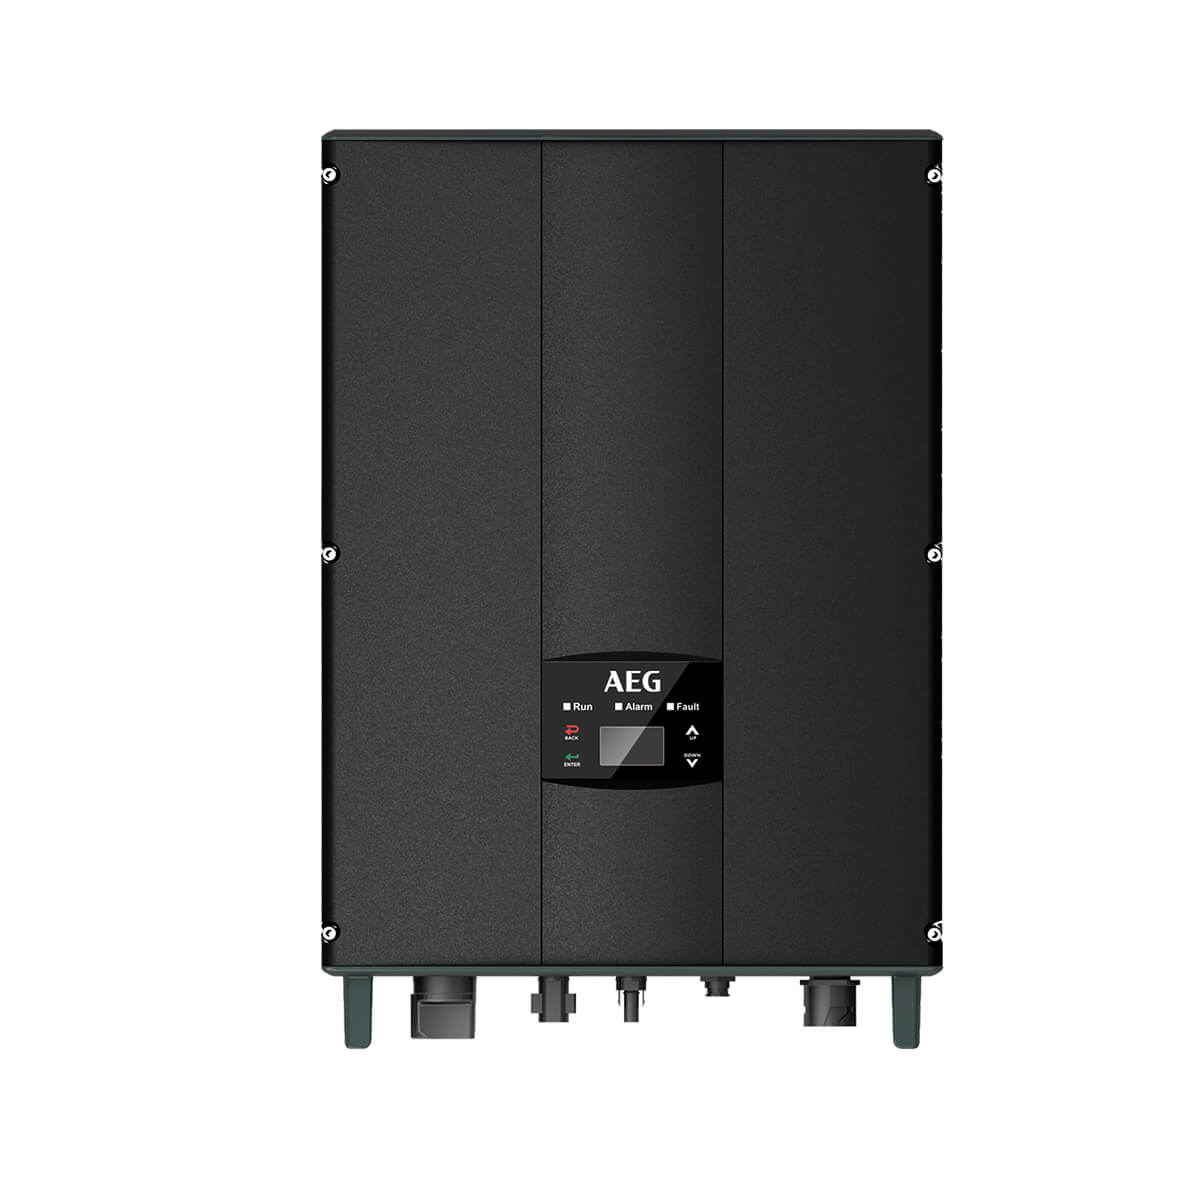 aeg 6kW inverter, aeg as-ic01 6kW inverter, aeg as-ic01-6000-2 inverter, aeg as-ic01-6000-2, aeg as-ic01 6kW